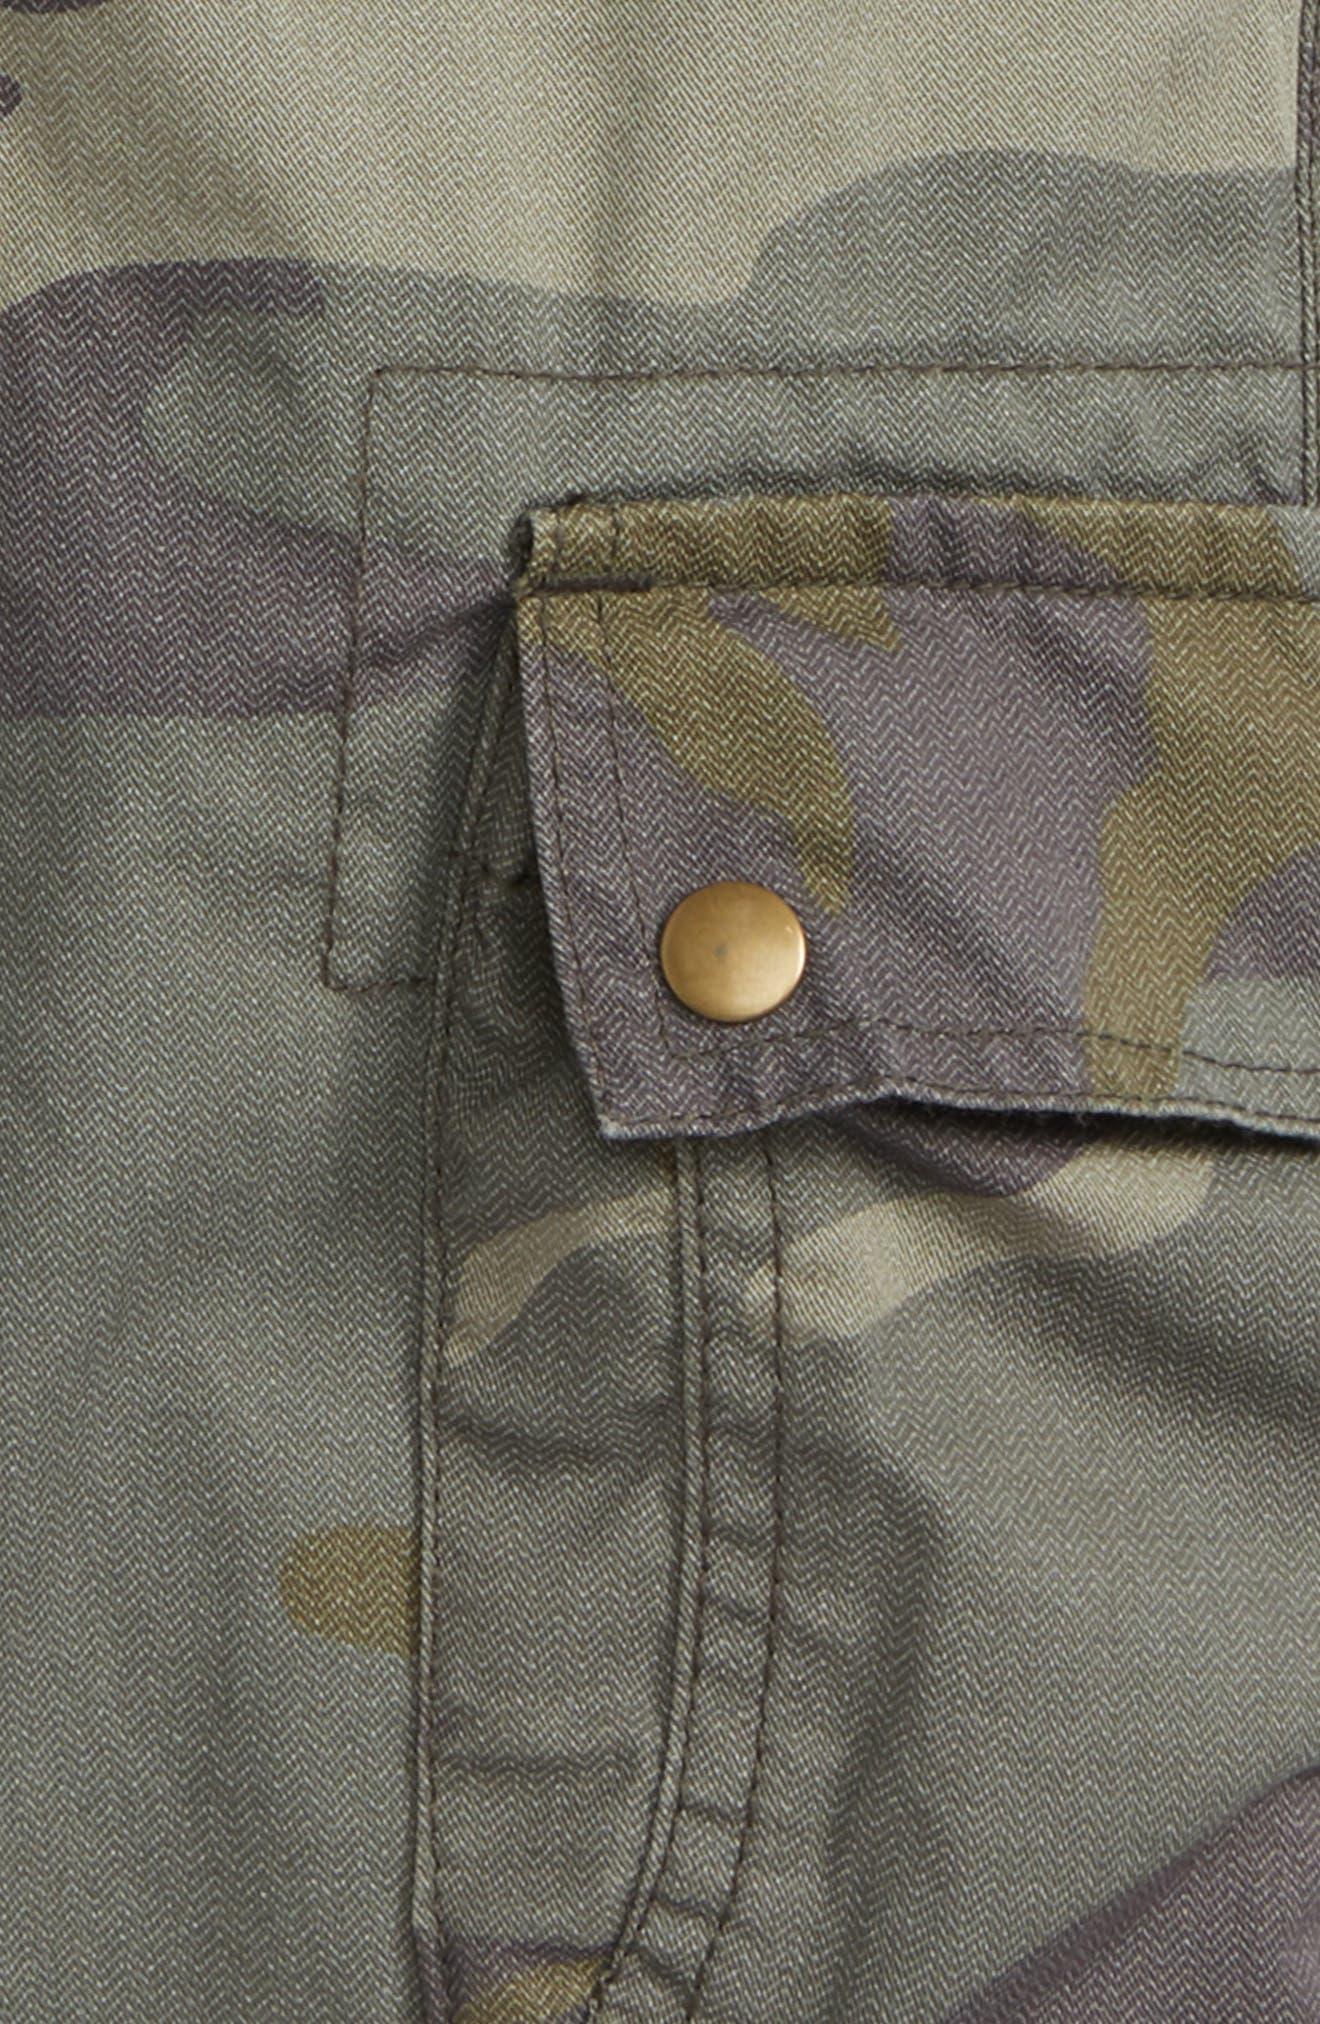 Camo Cargo Shorts,                             Alternate thumbnail 3, color,                             Olive